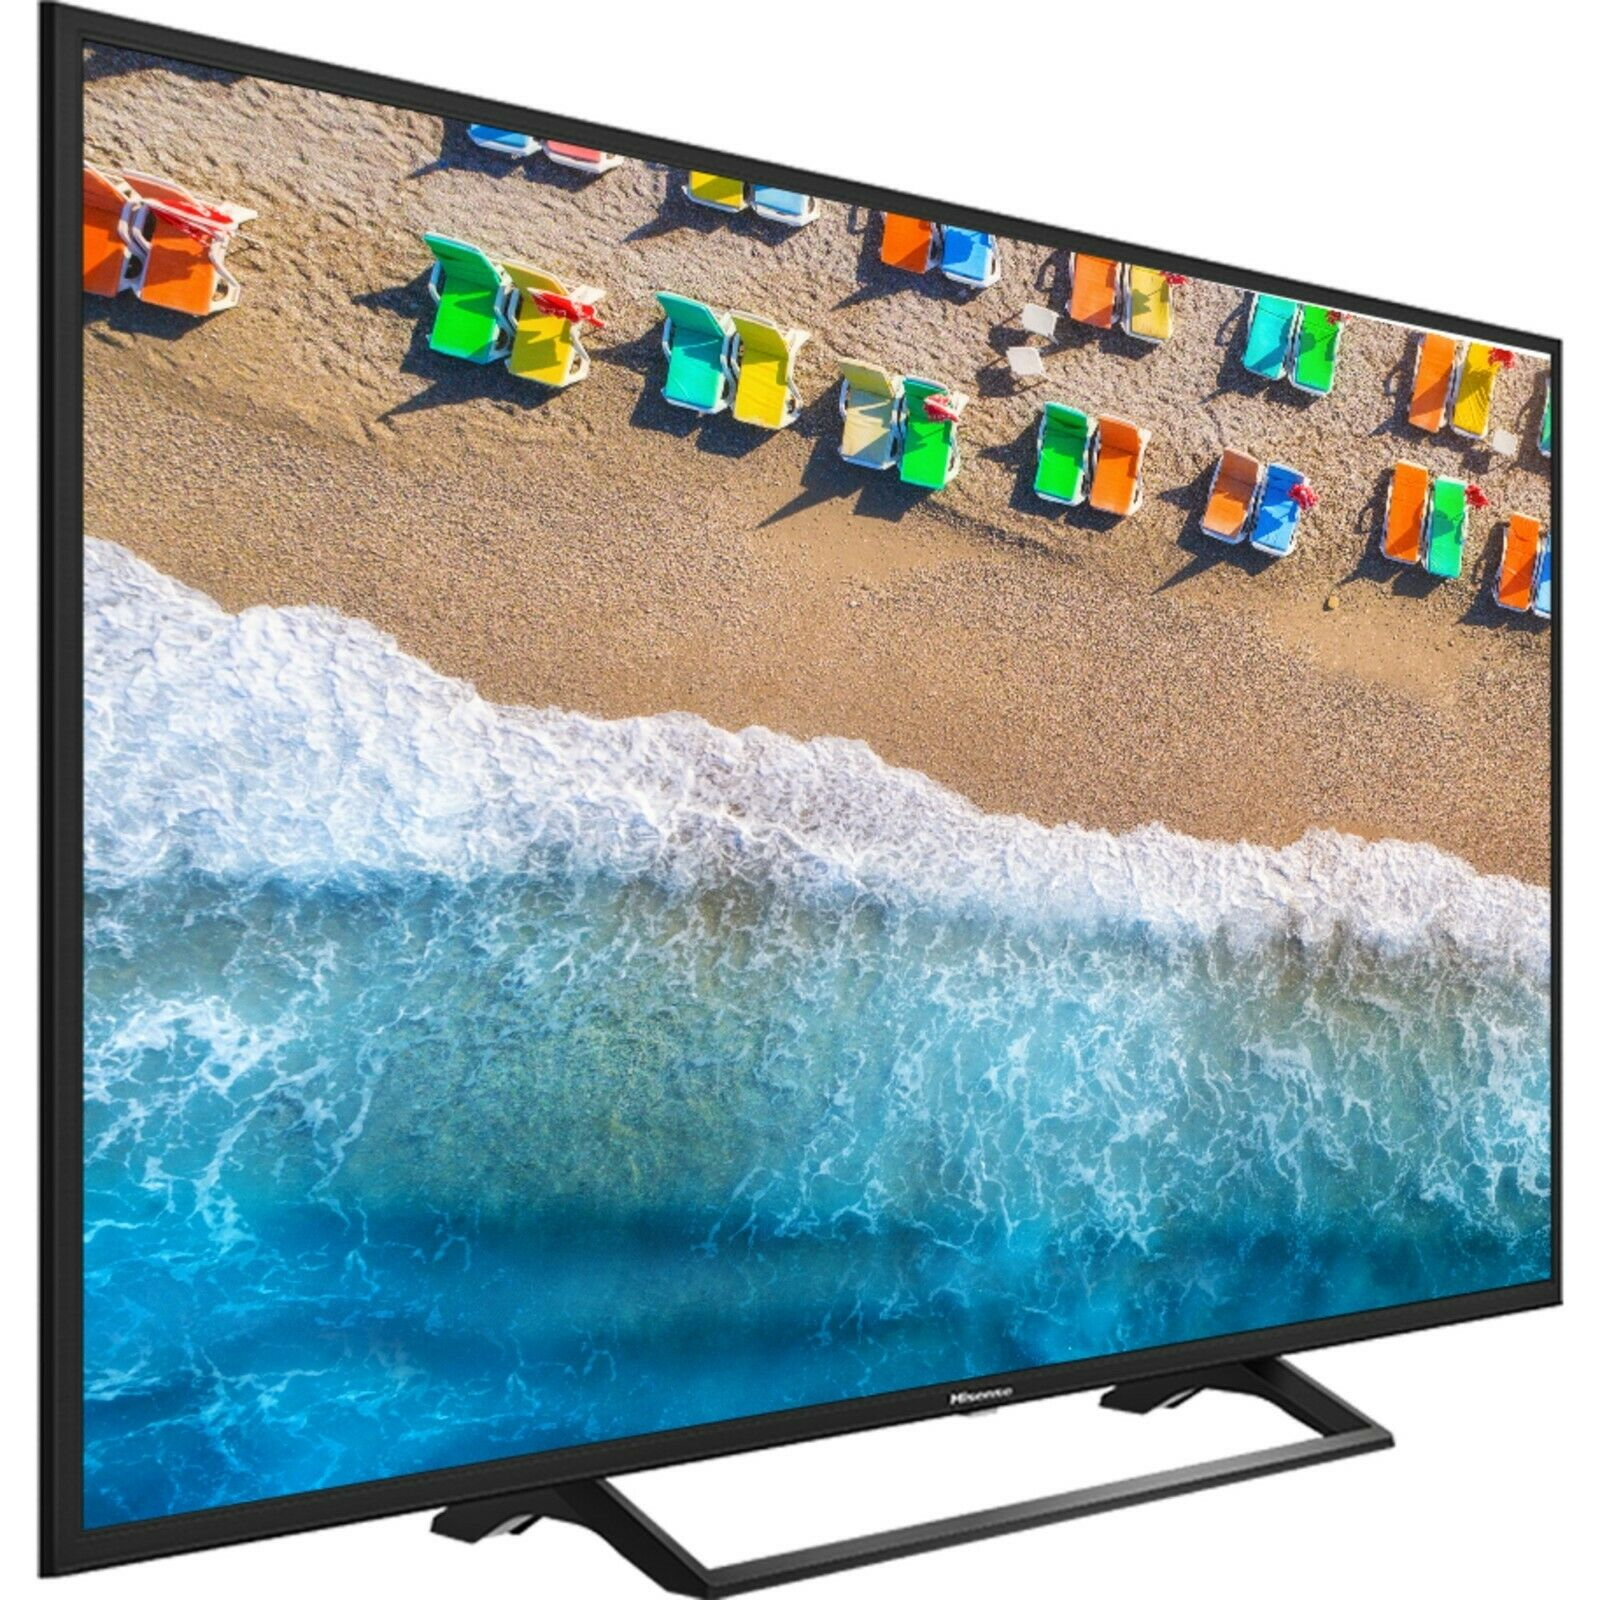 Hisense H43BE7200 43 Zoll UHD LED-Fernseher Smart TV Triple Tuner 1400 PCI